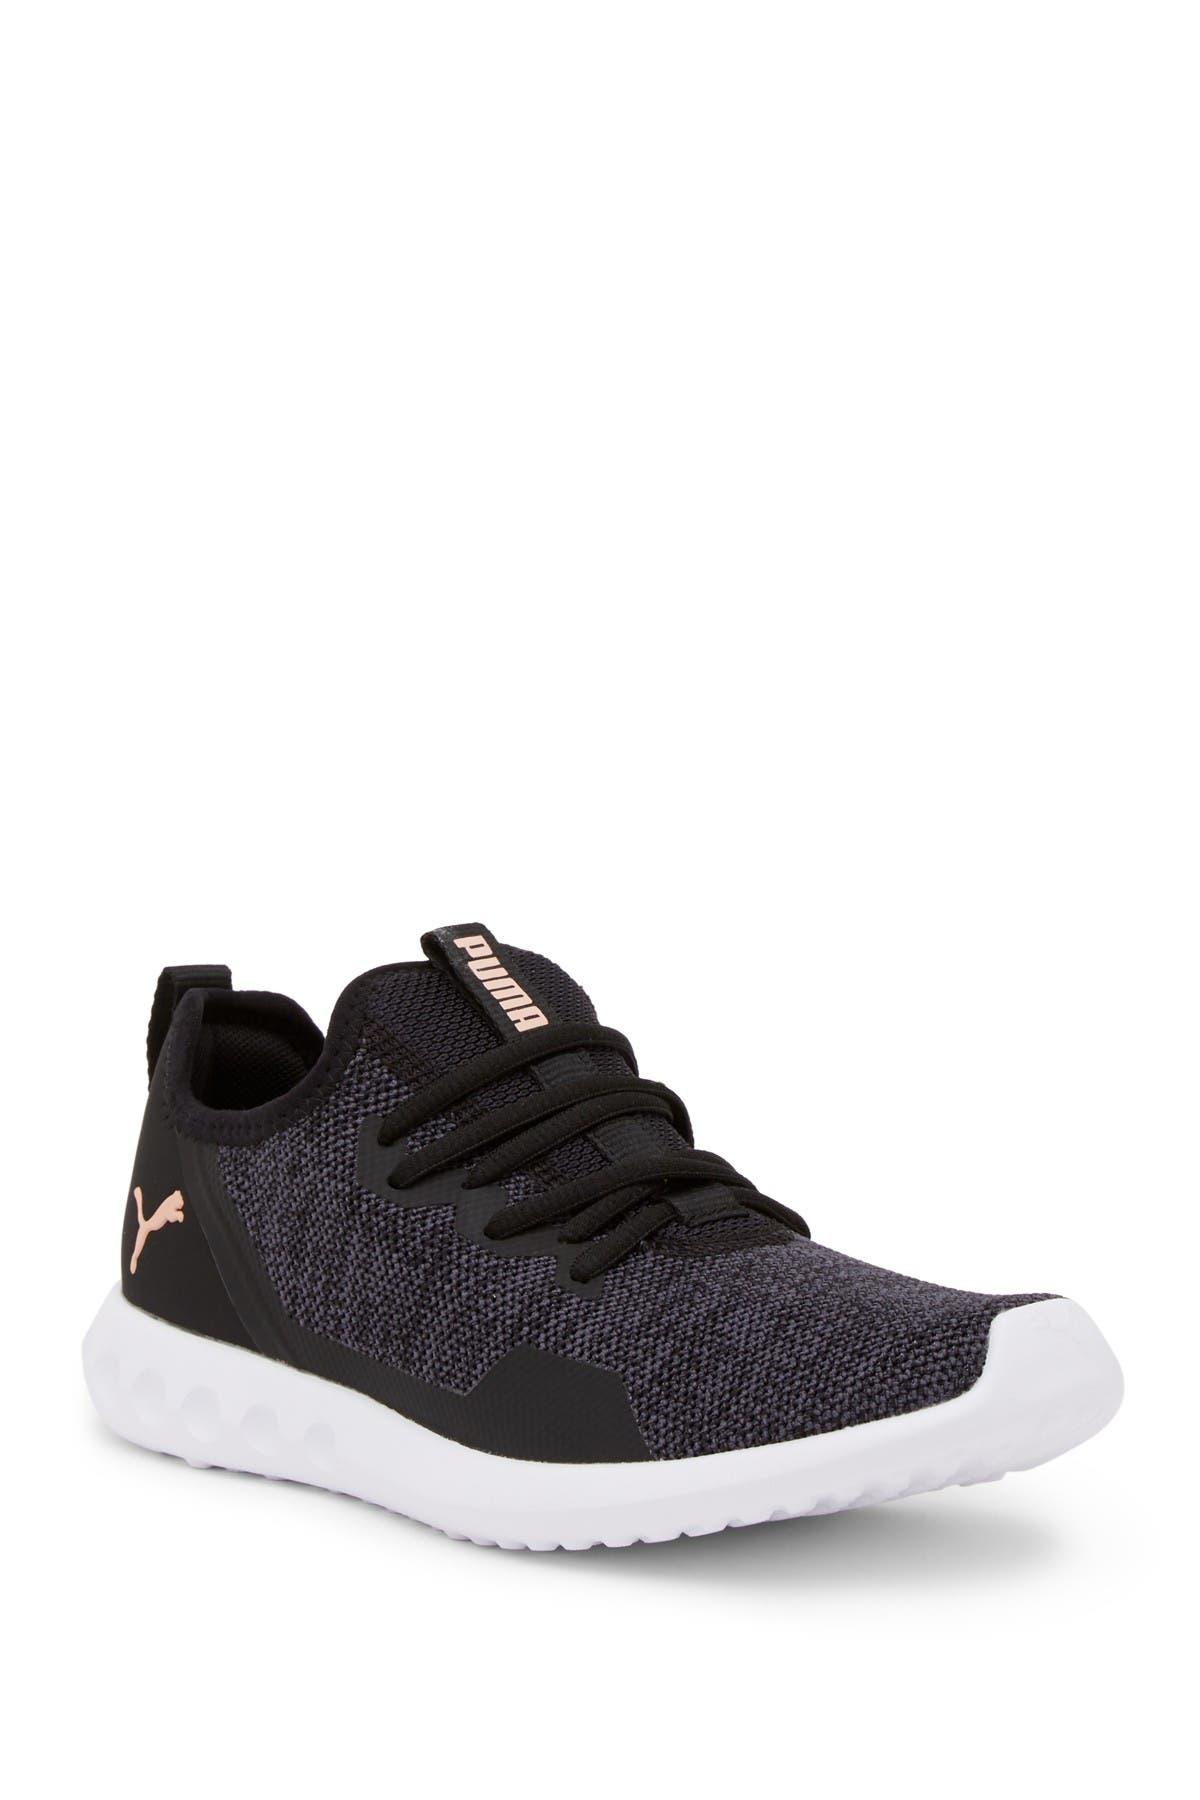 PUMA | Carson 2X Knit Sneaker